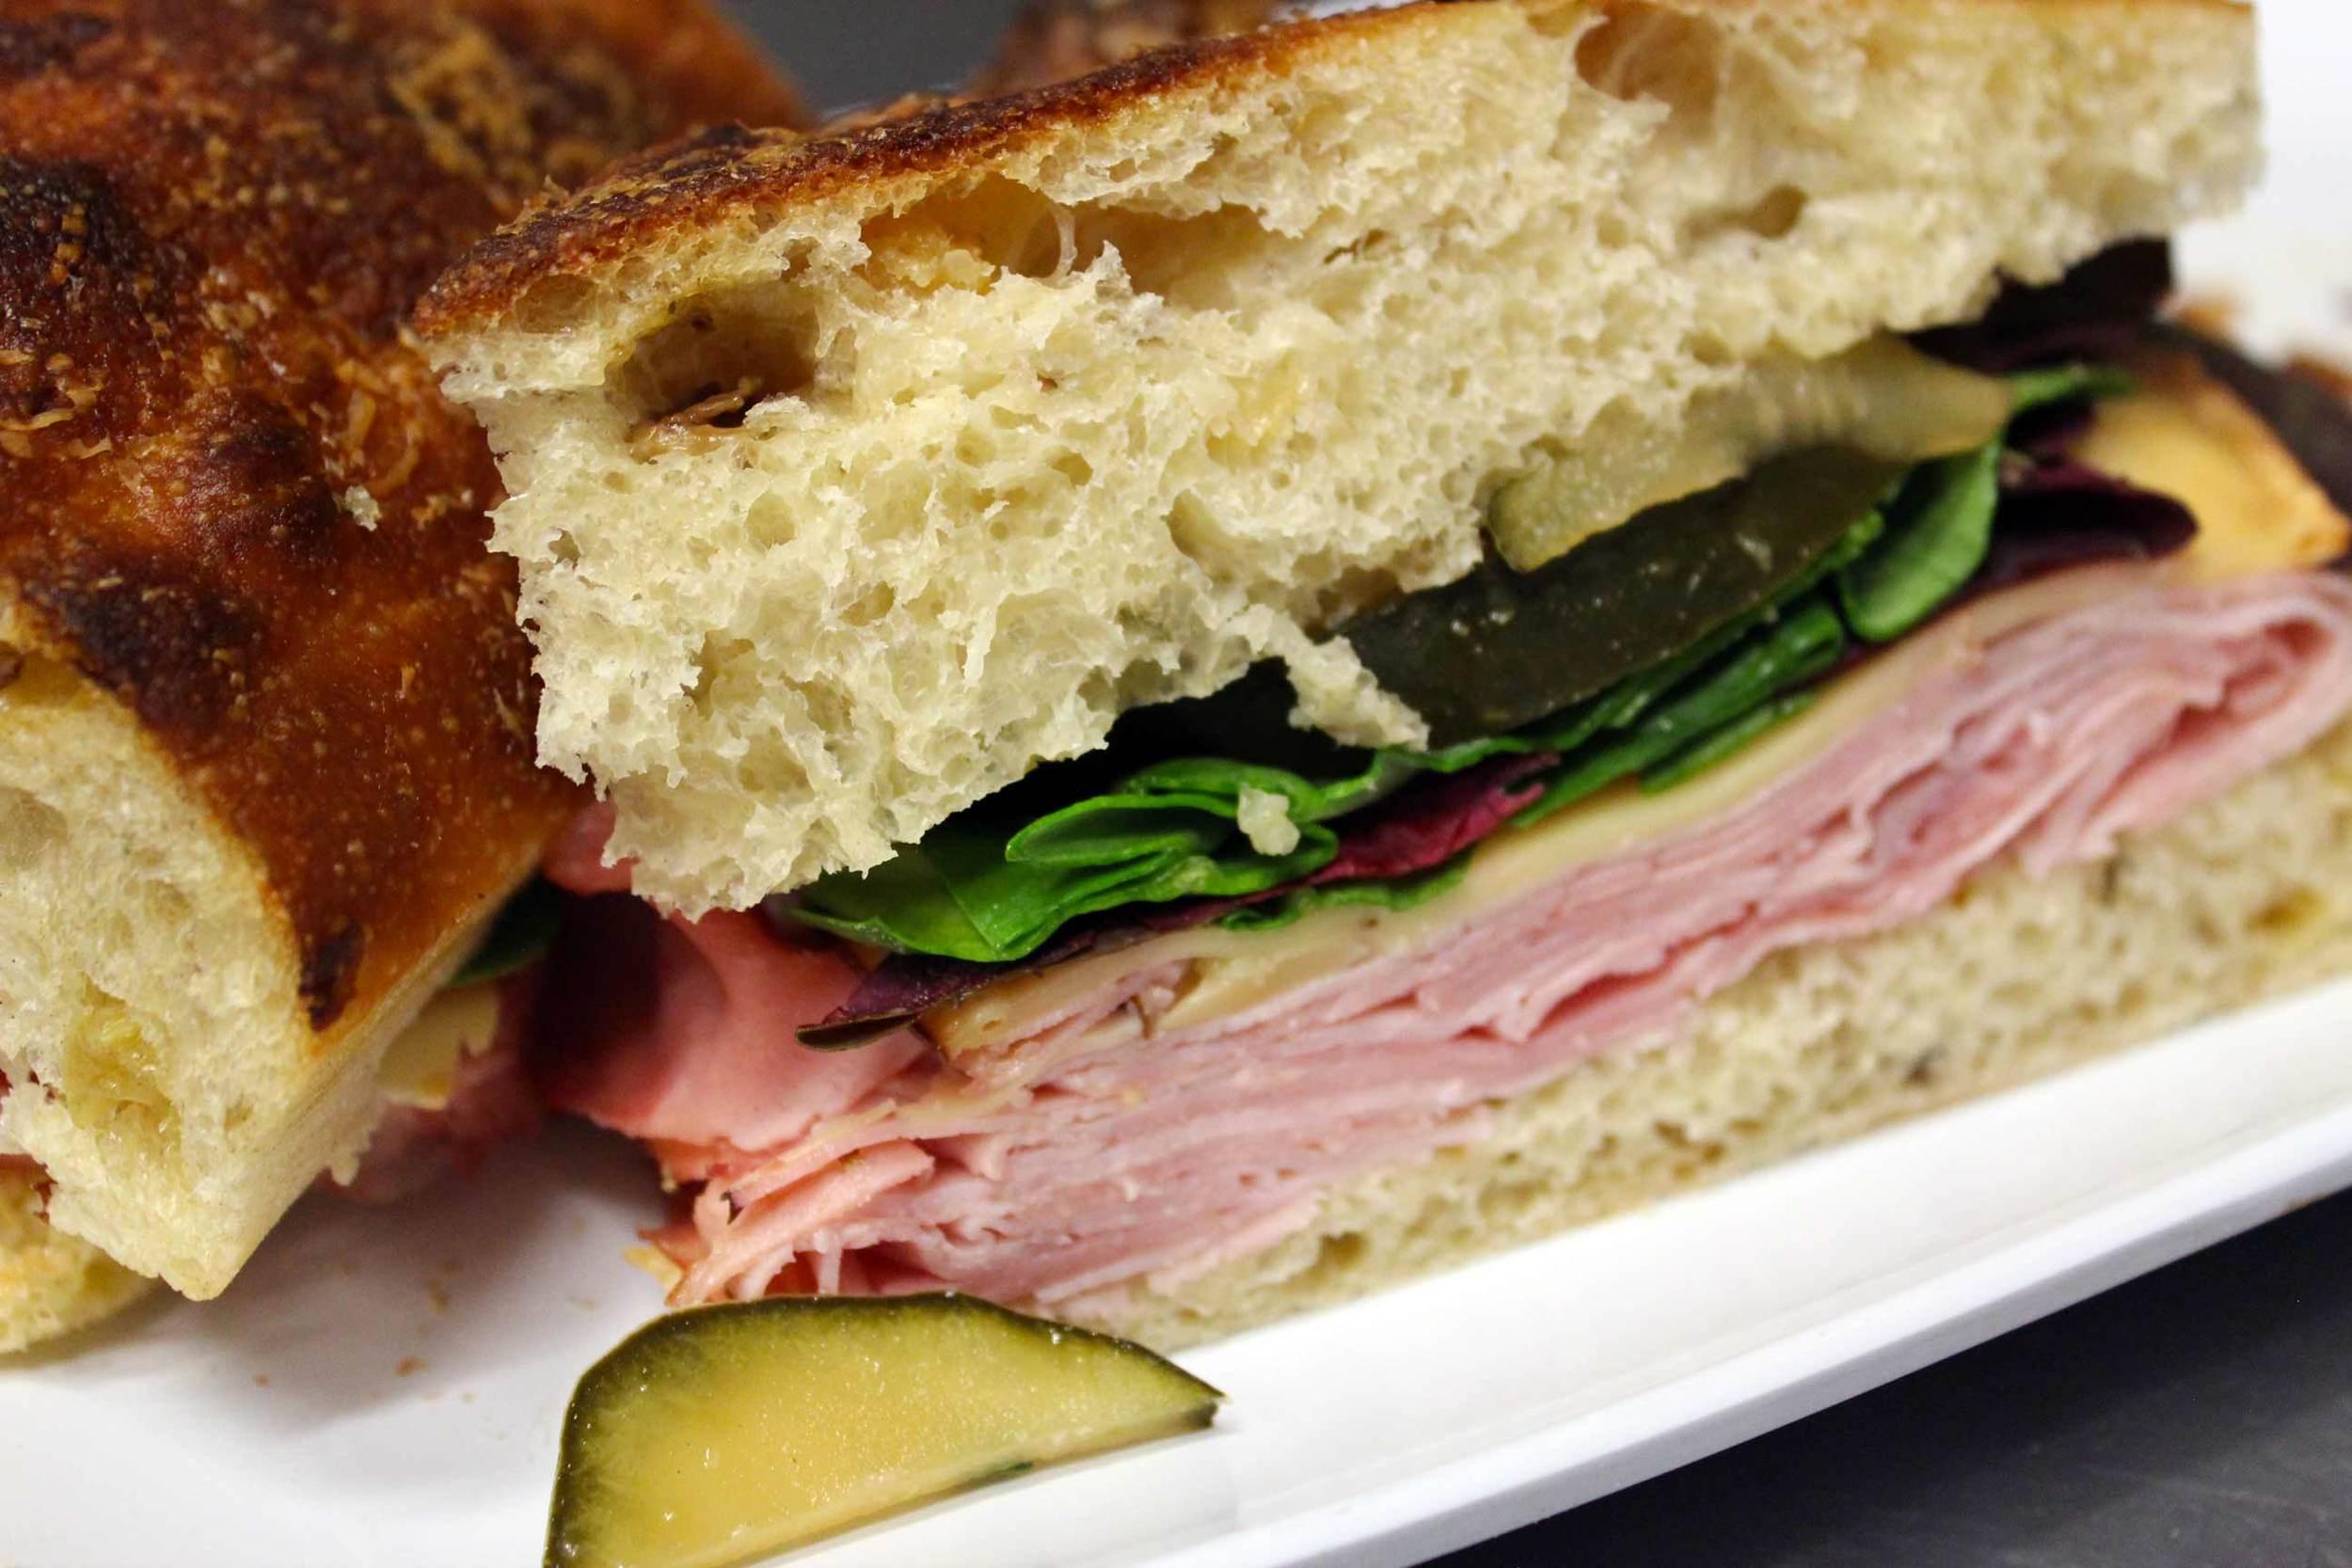 IMG_6211_Mtuccis_Italian_Ham_Sandwich.jpg